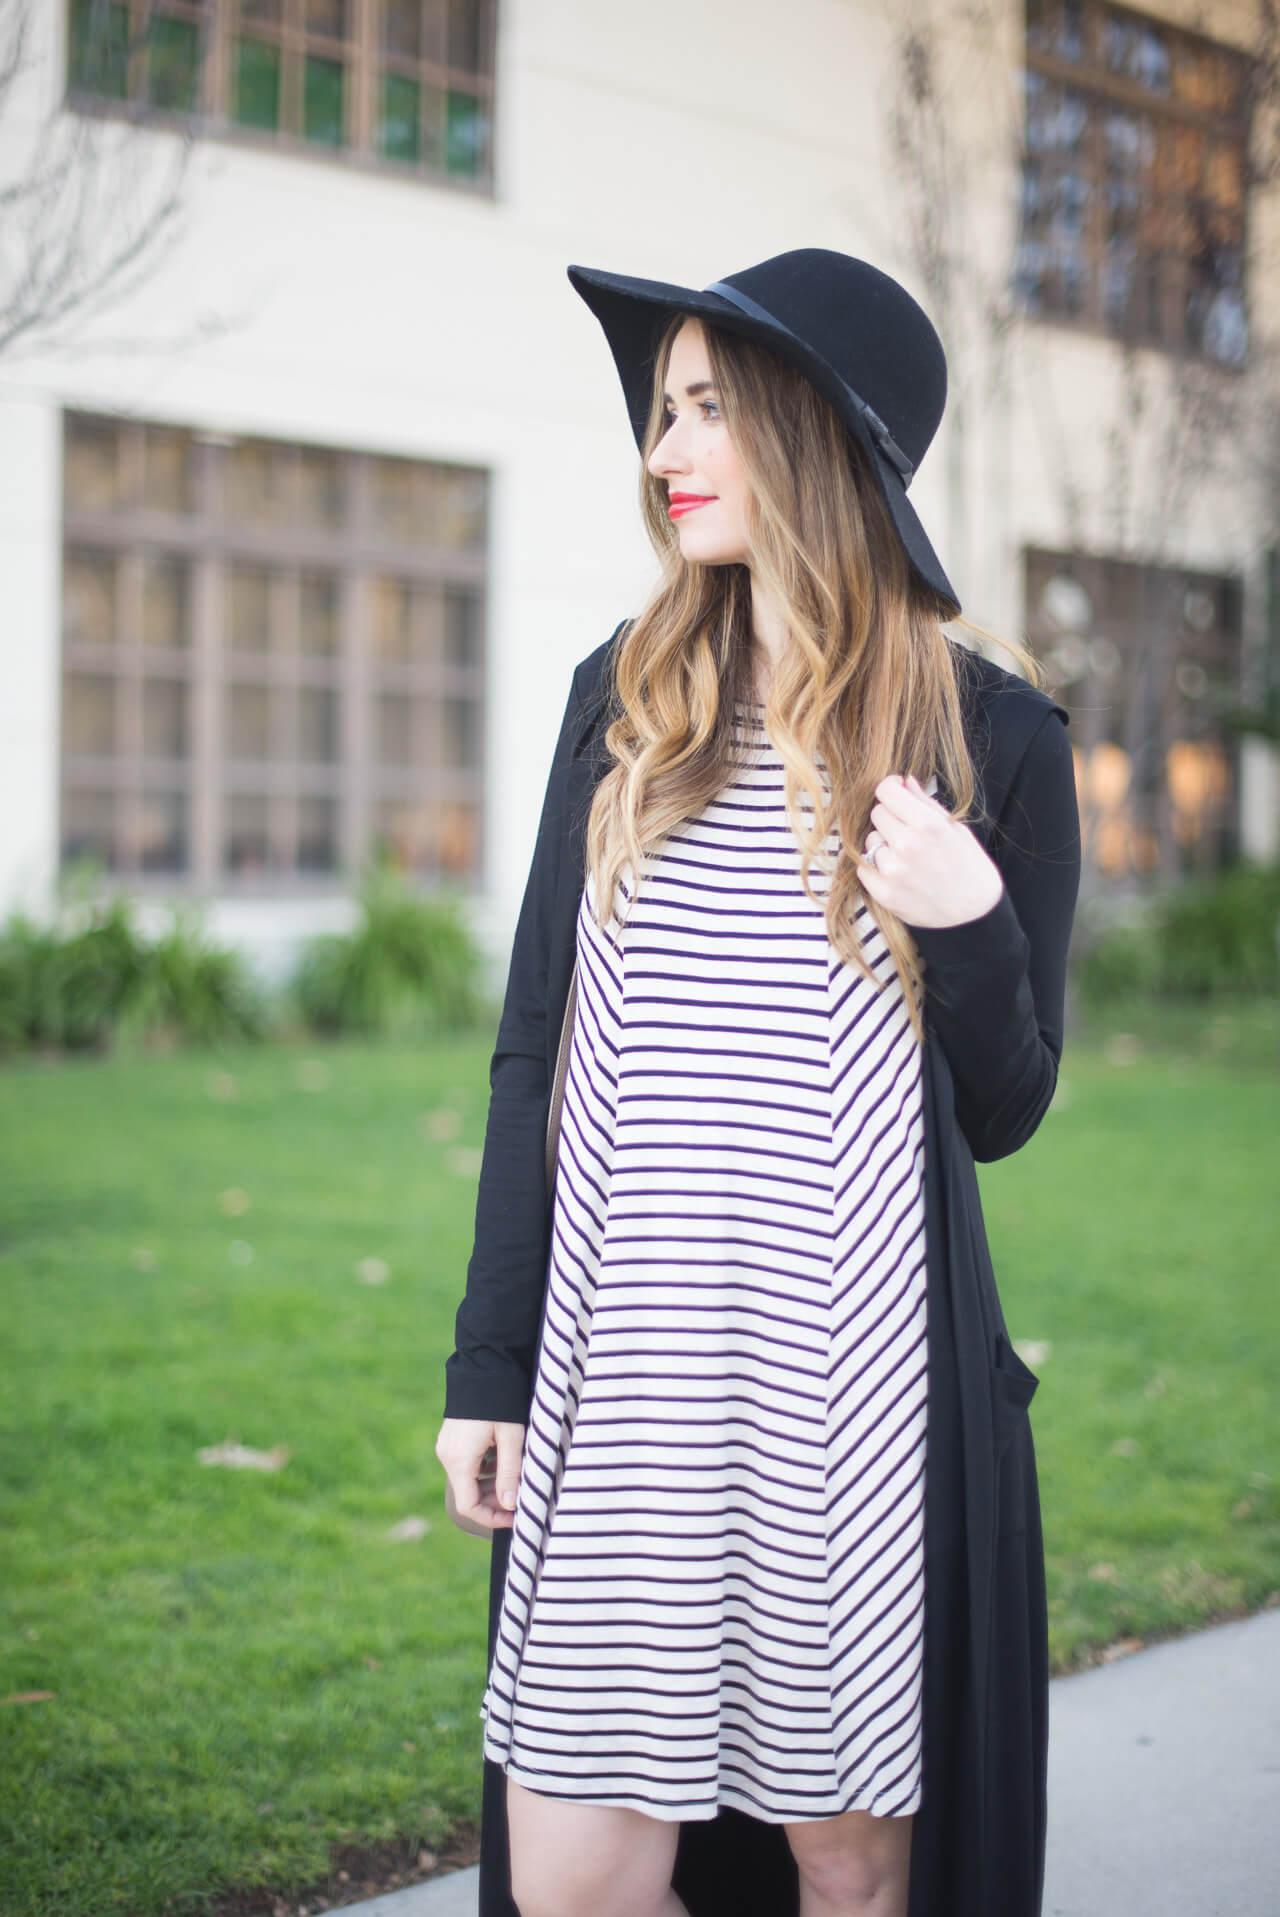 black floppy hat and striped dress